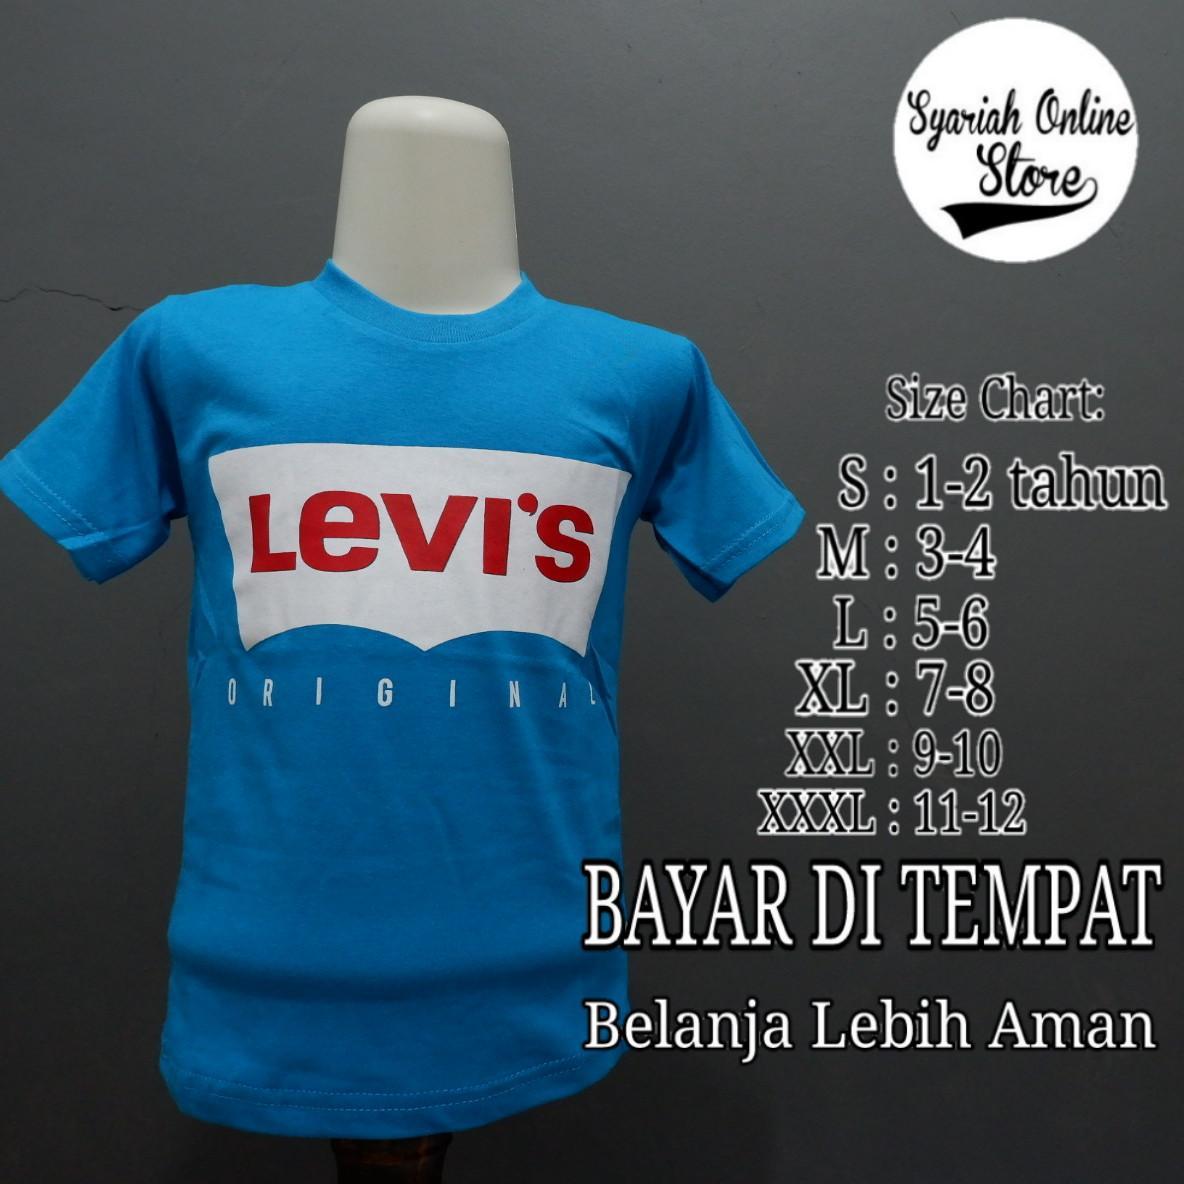 Kaos/baju Anak Motif Distro Levis By Syariah Online Store.